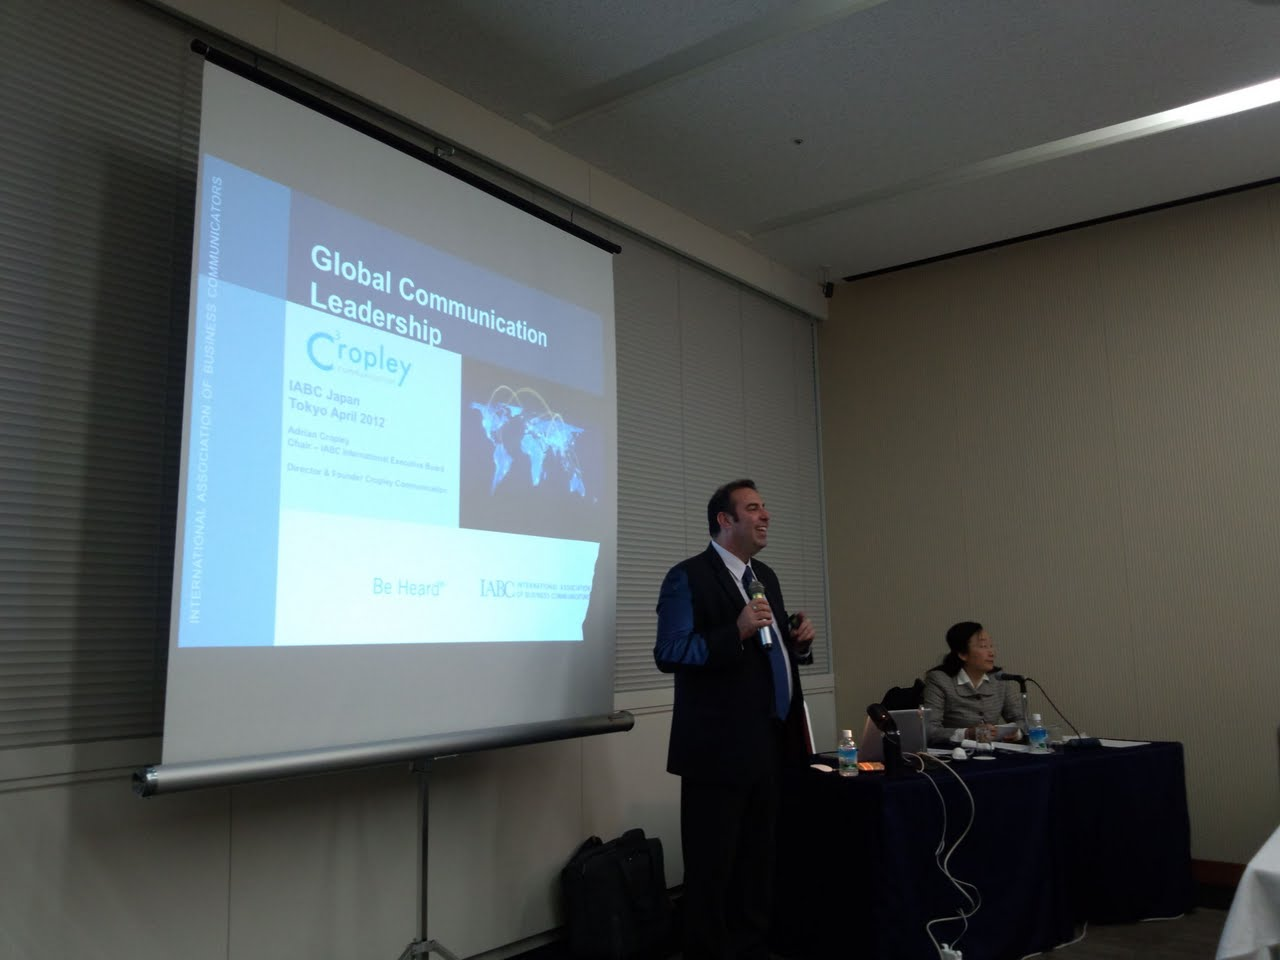 IABCセミナー「世界が求める日本のコミュニケーション・リーダーシップ」_e0123104_701015.jpg